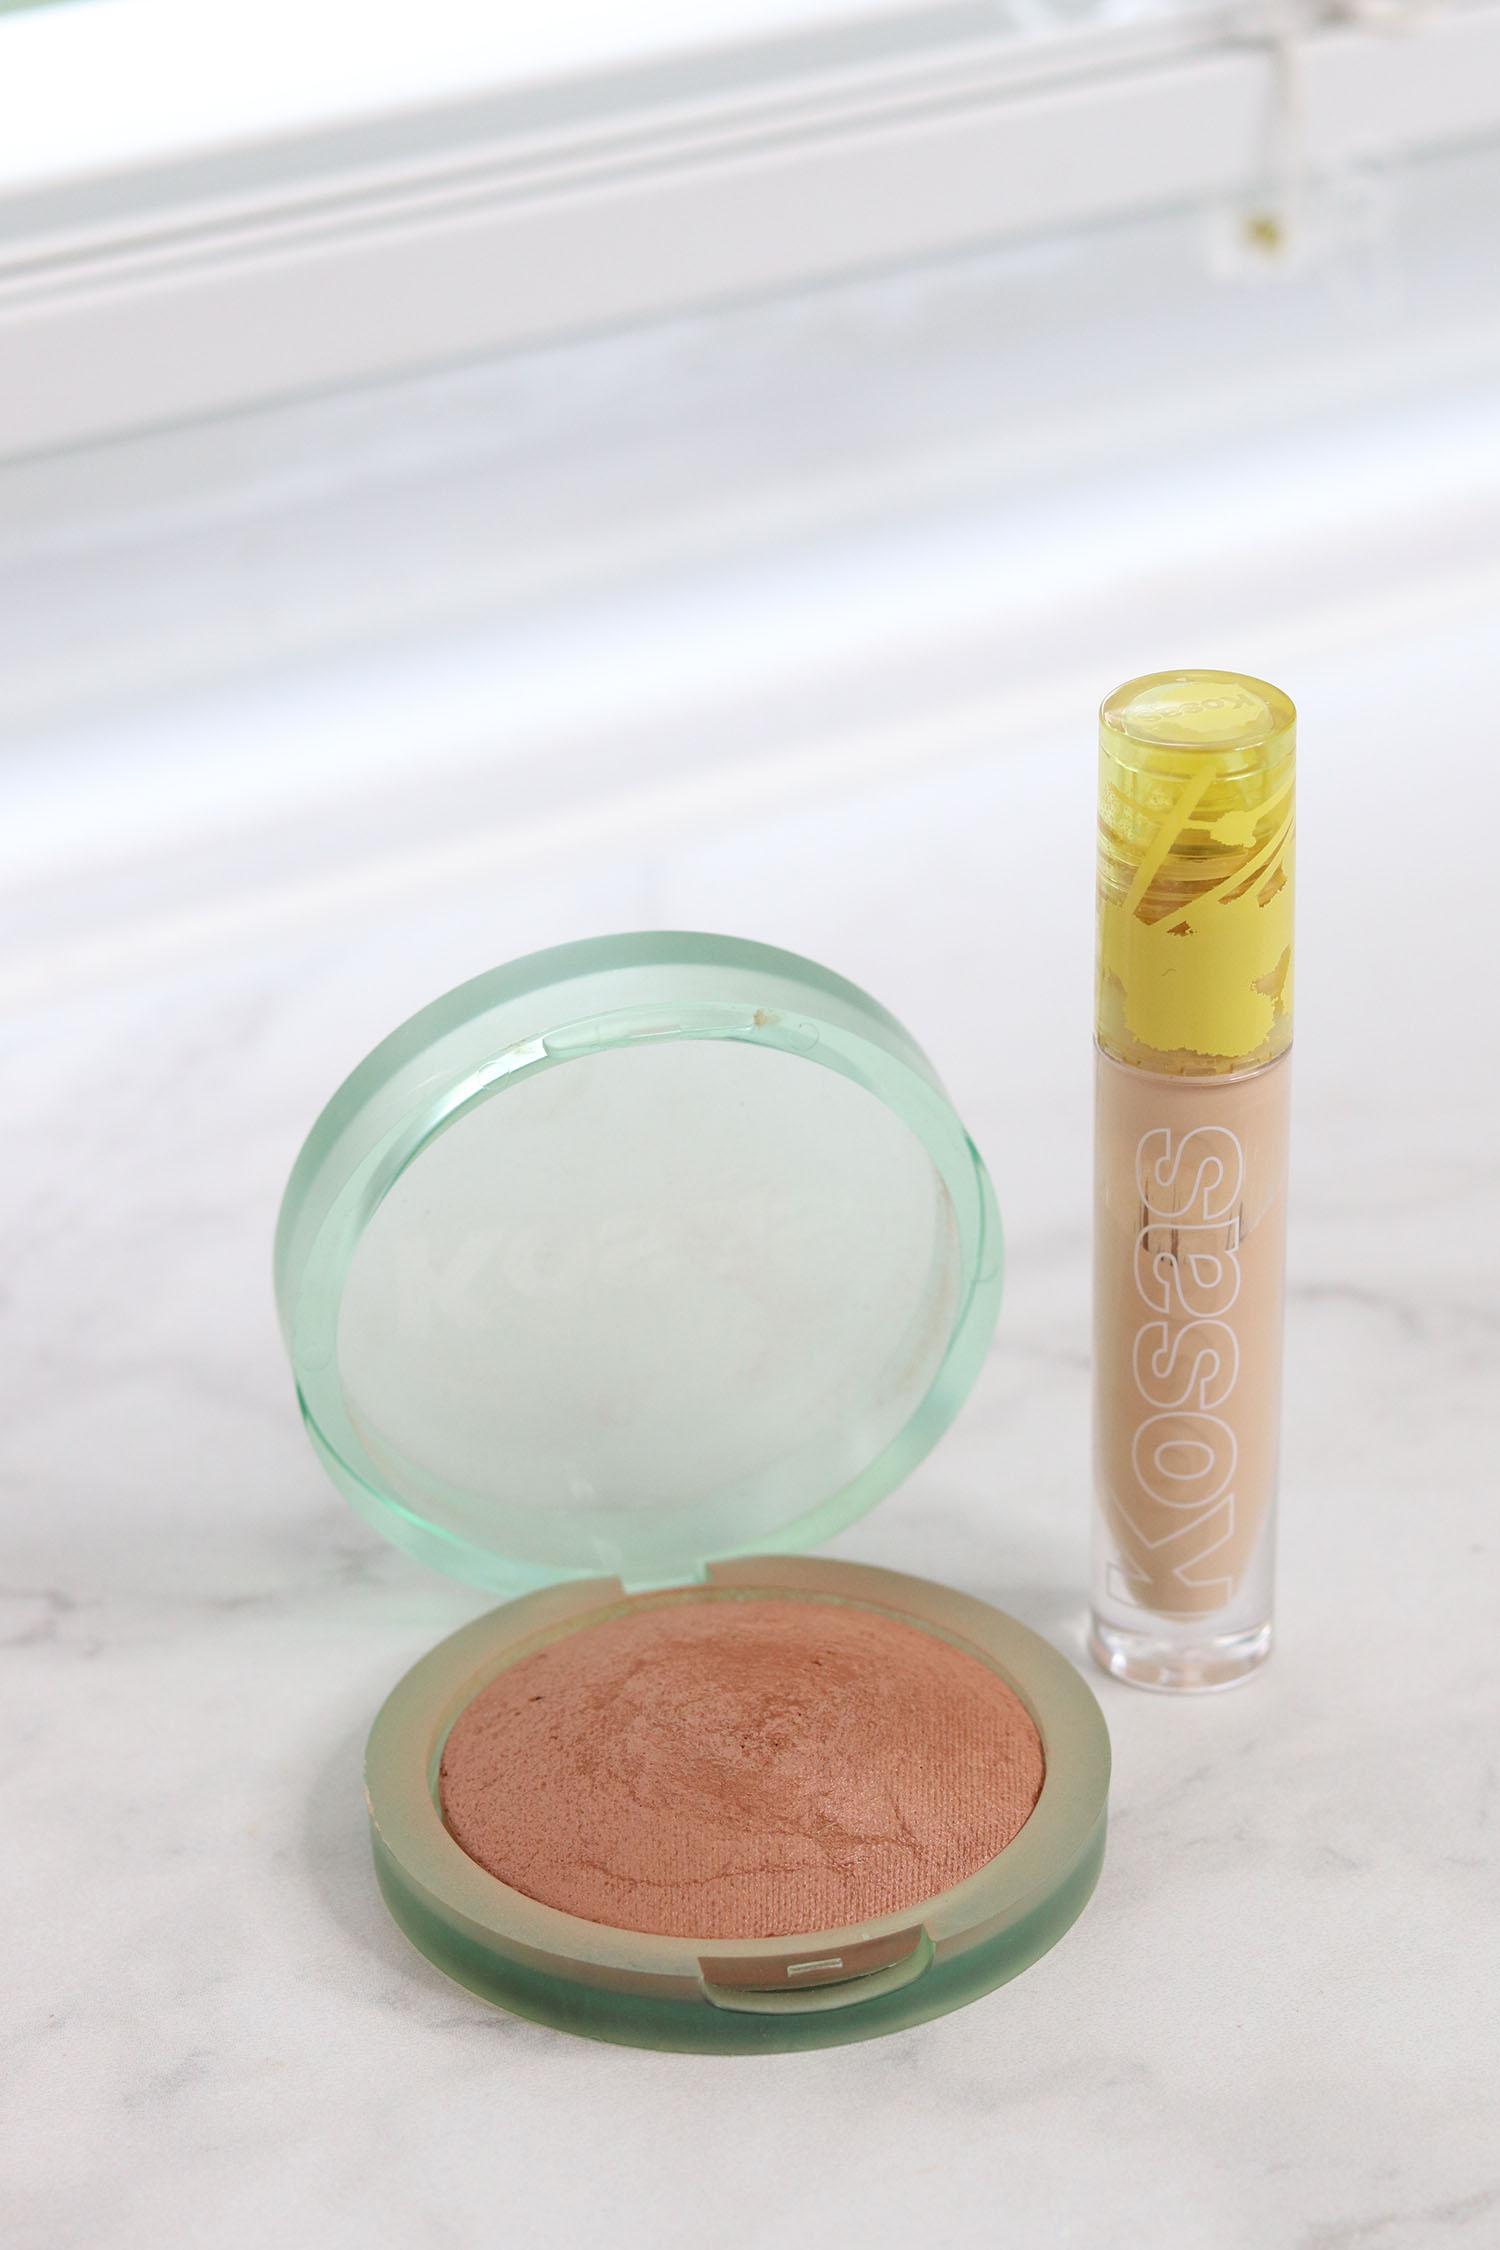 Kosas Bronzer in Medium, Kosas Revealer Concealer in Shade 4 | Spring Beauty Haul